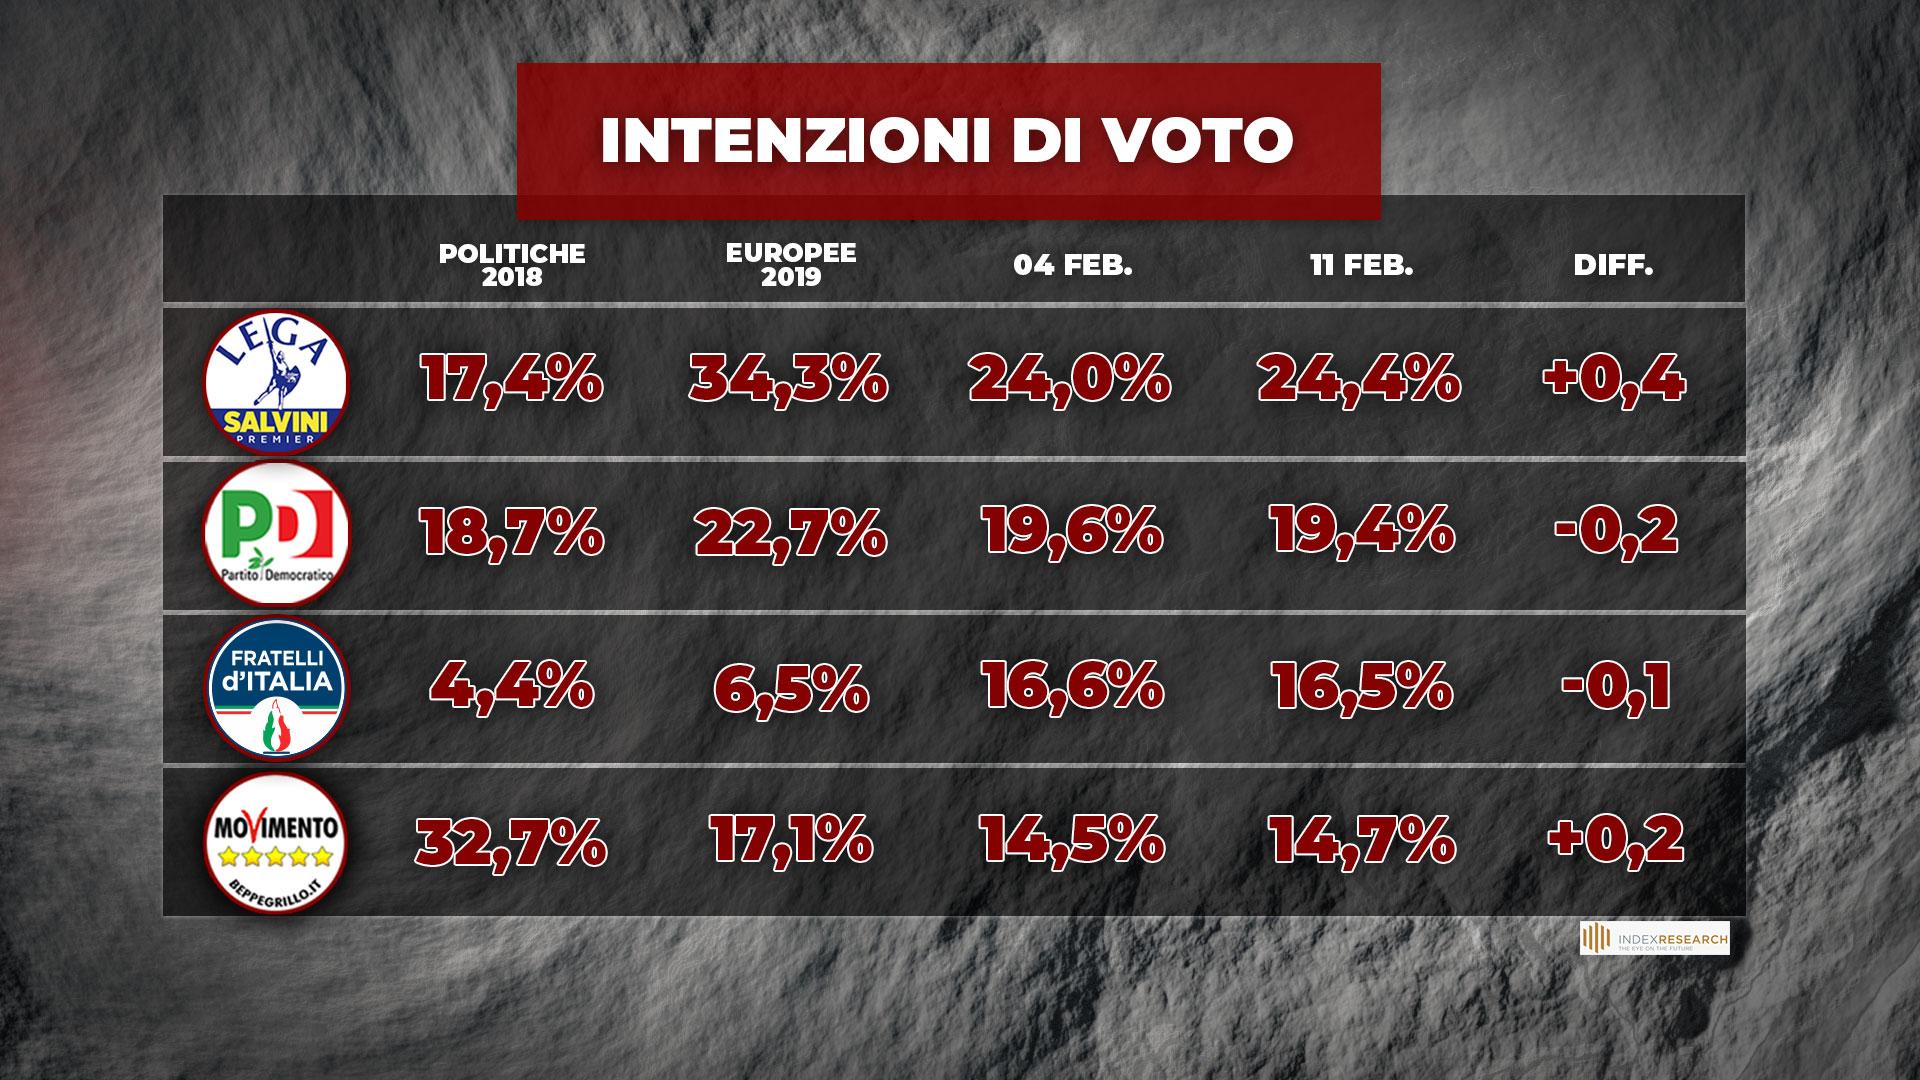 sondaggi politici oggi lega governo draghi